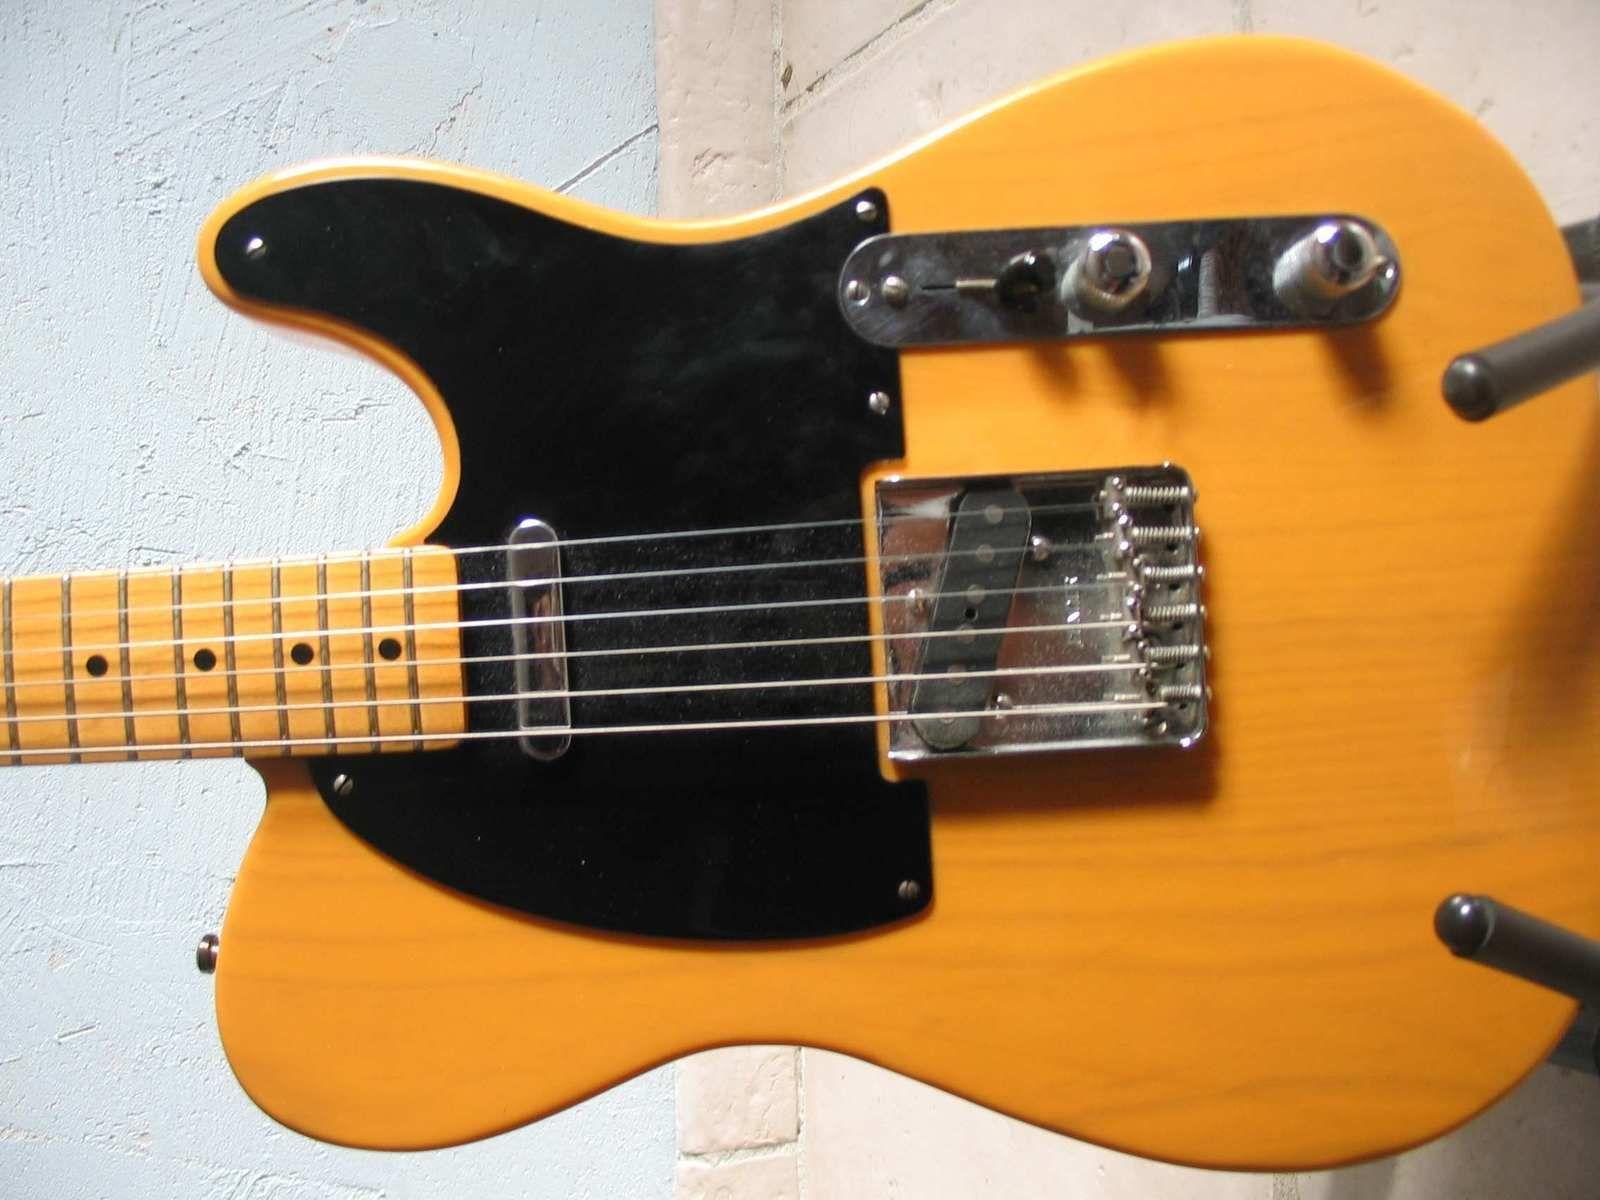 Fender American Vintage 52 Telecaster - Butterscotch